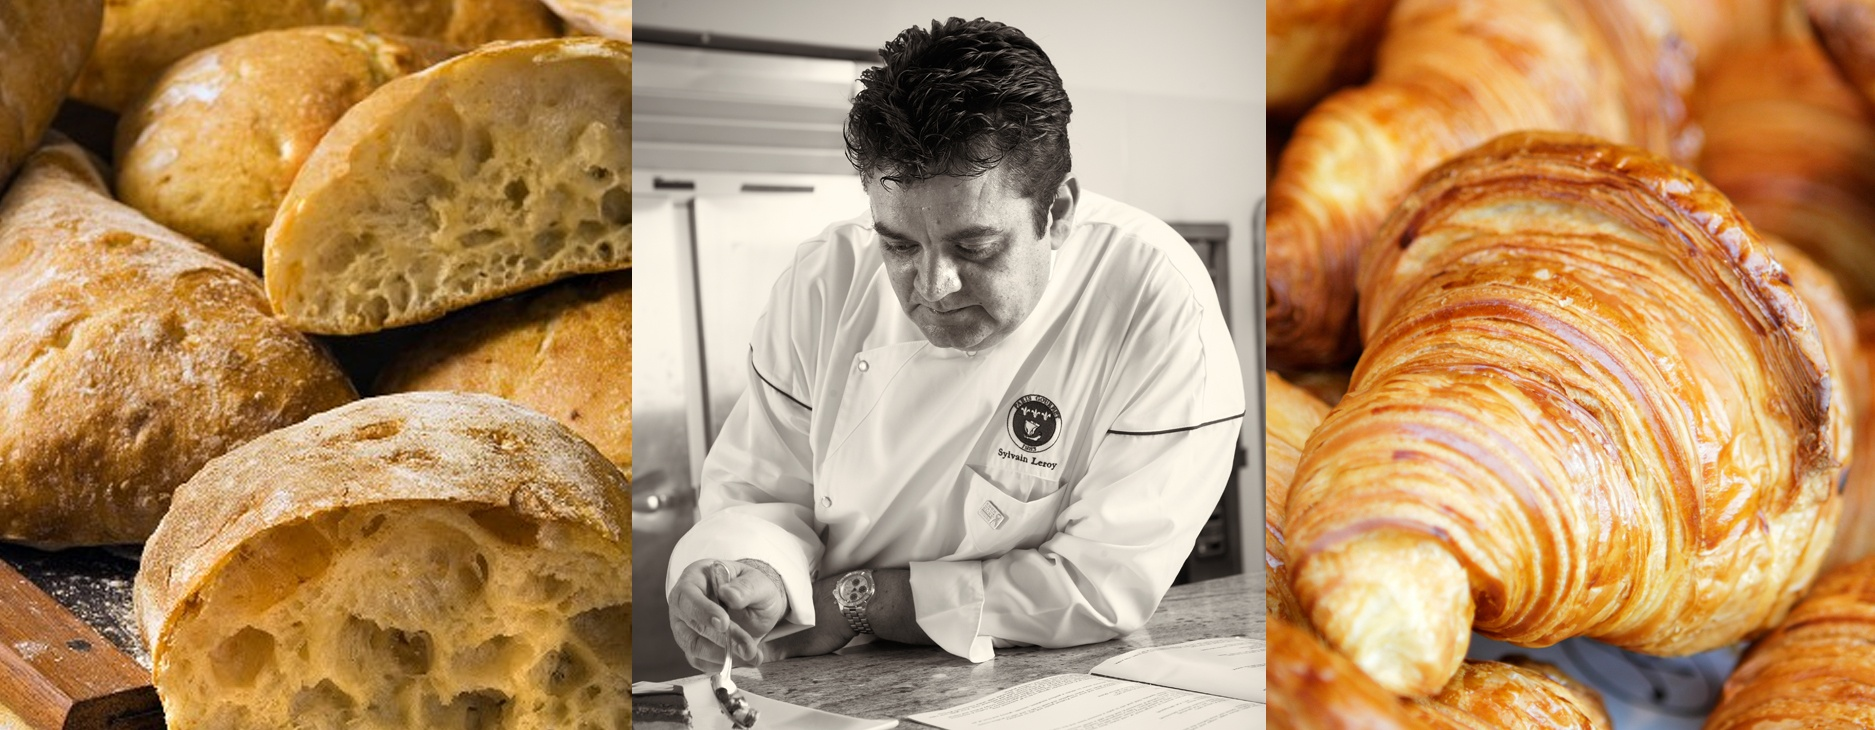 noel gourmand paris 2018 Paris Gourmet – Specialty Food Importer noel gourmand paris 2018